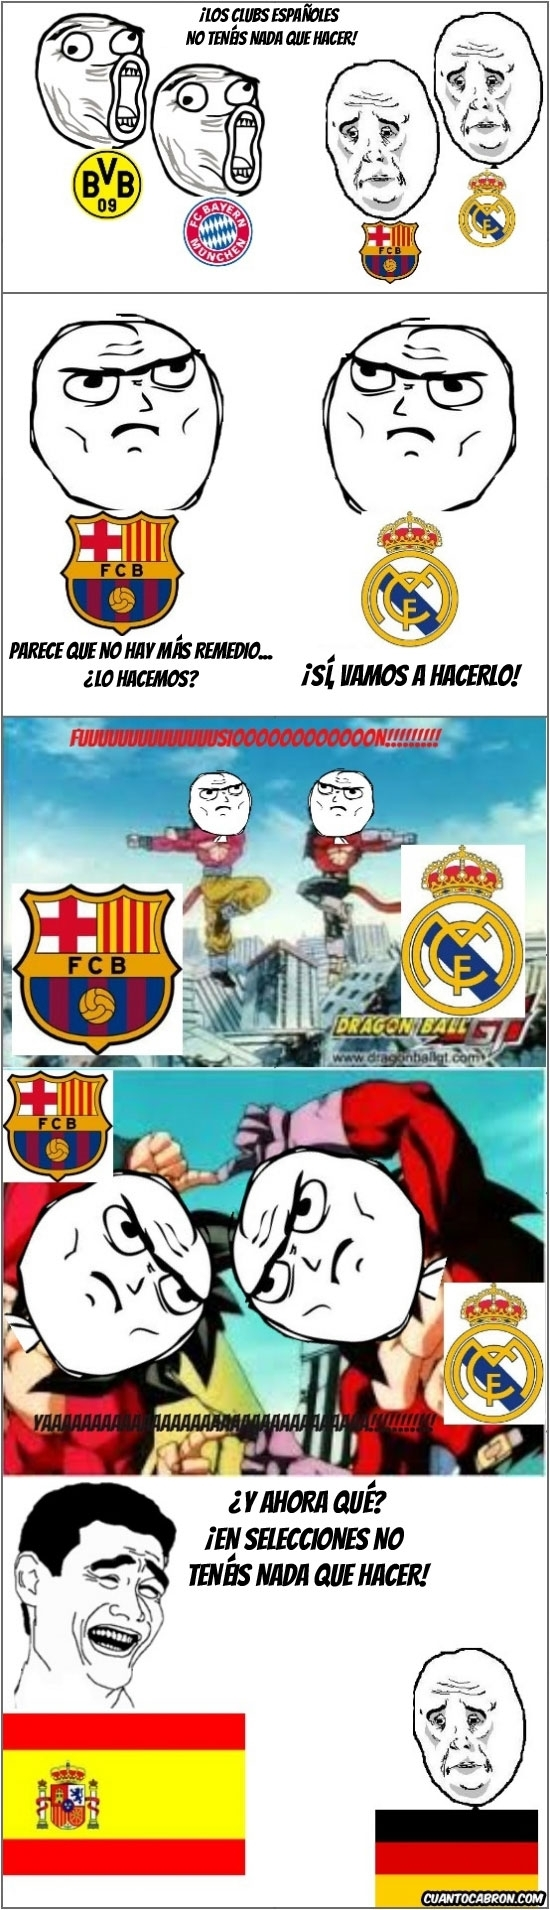 Mix - ¡FUSIÓN futbolística YA!